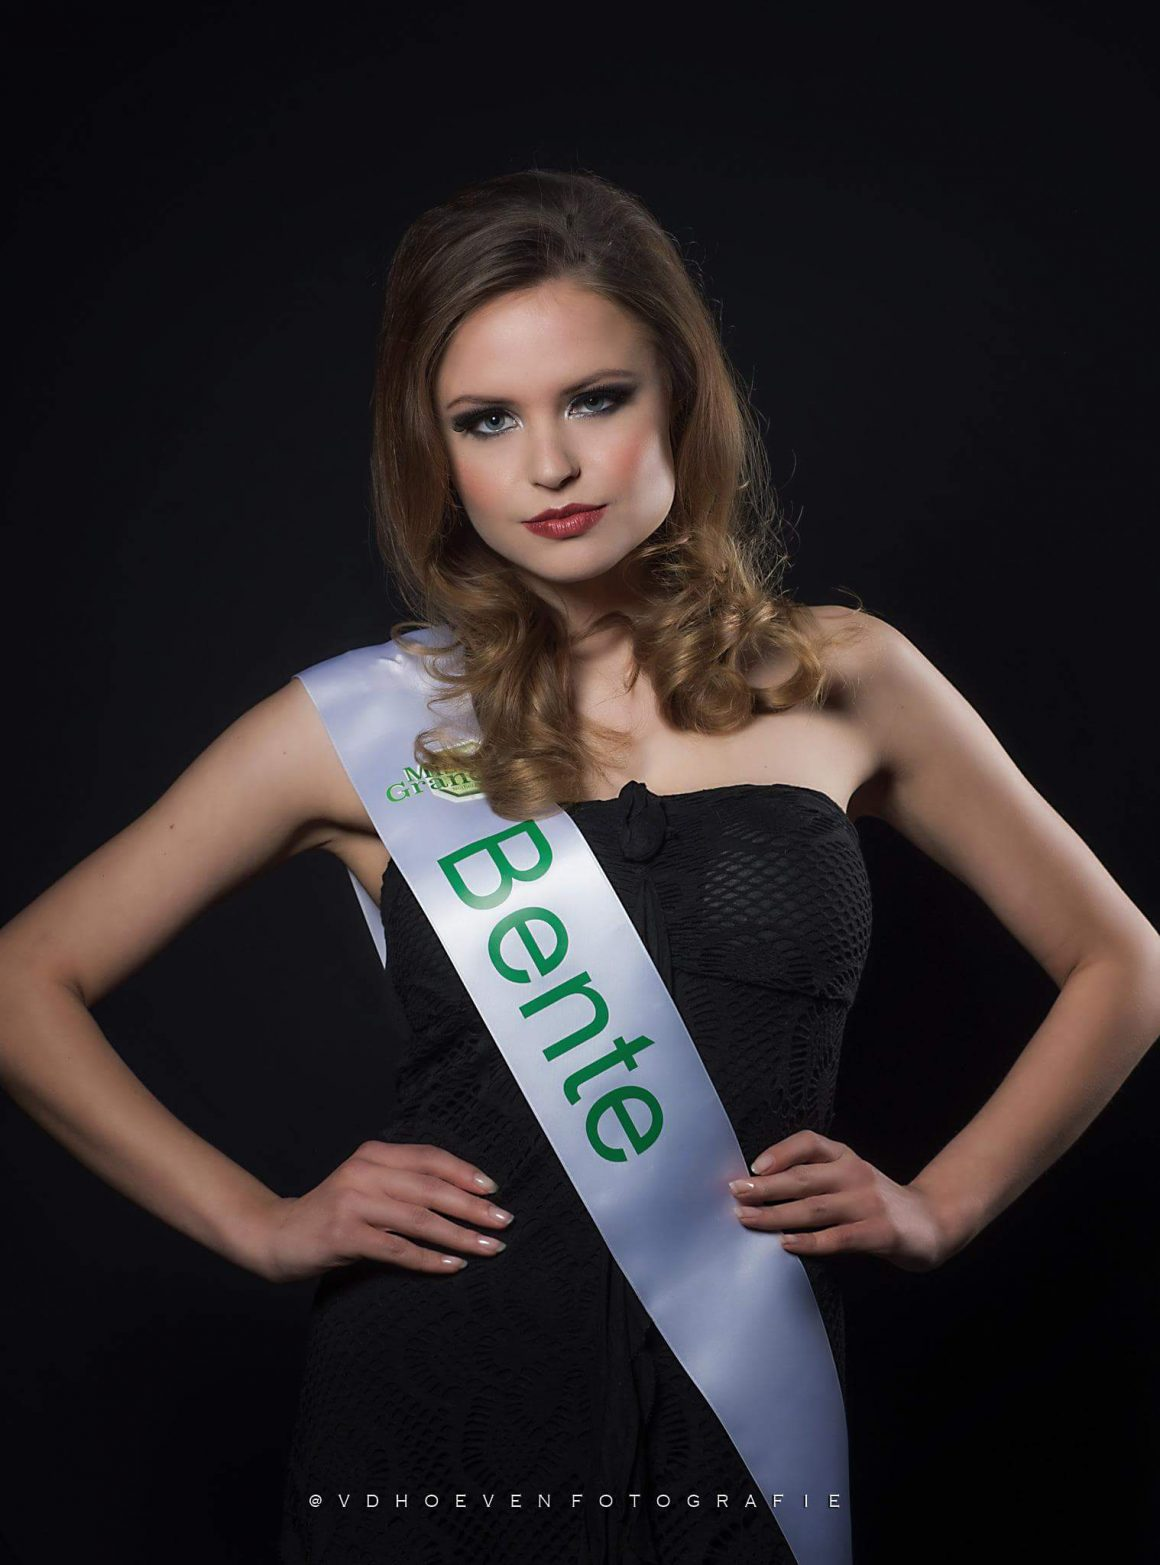 Miss Verkiezing The Grand Netherlands